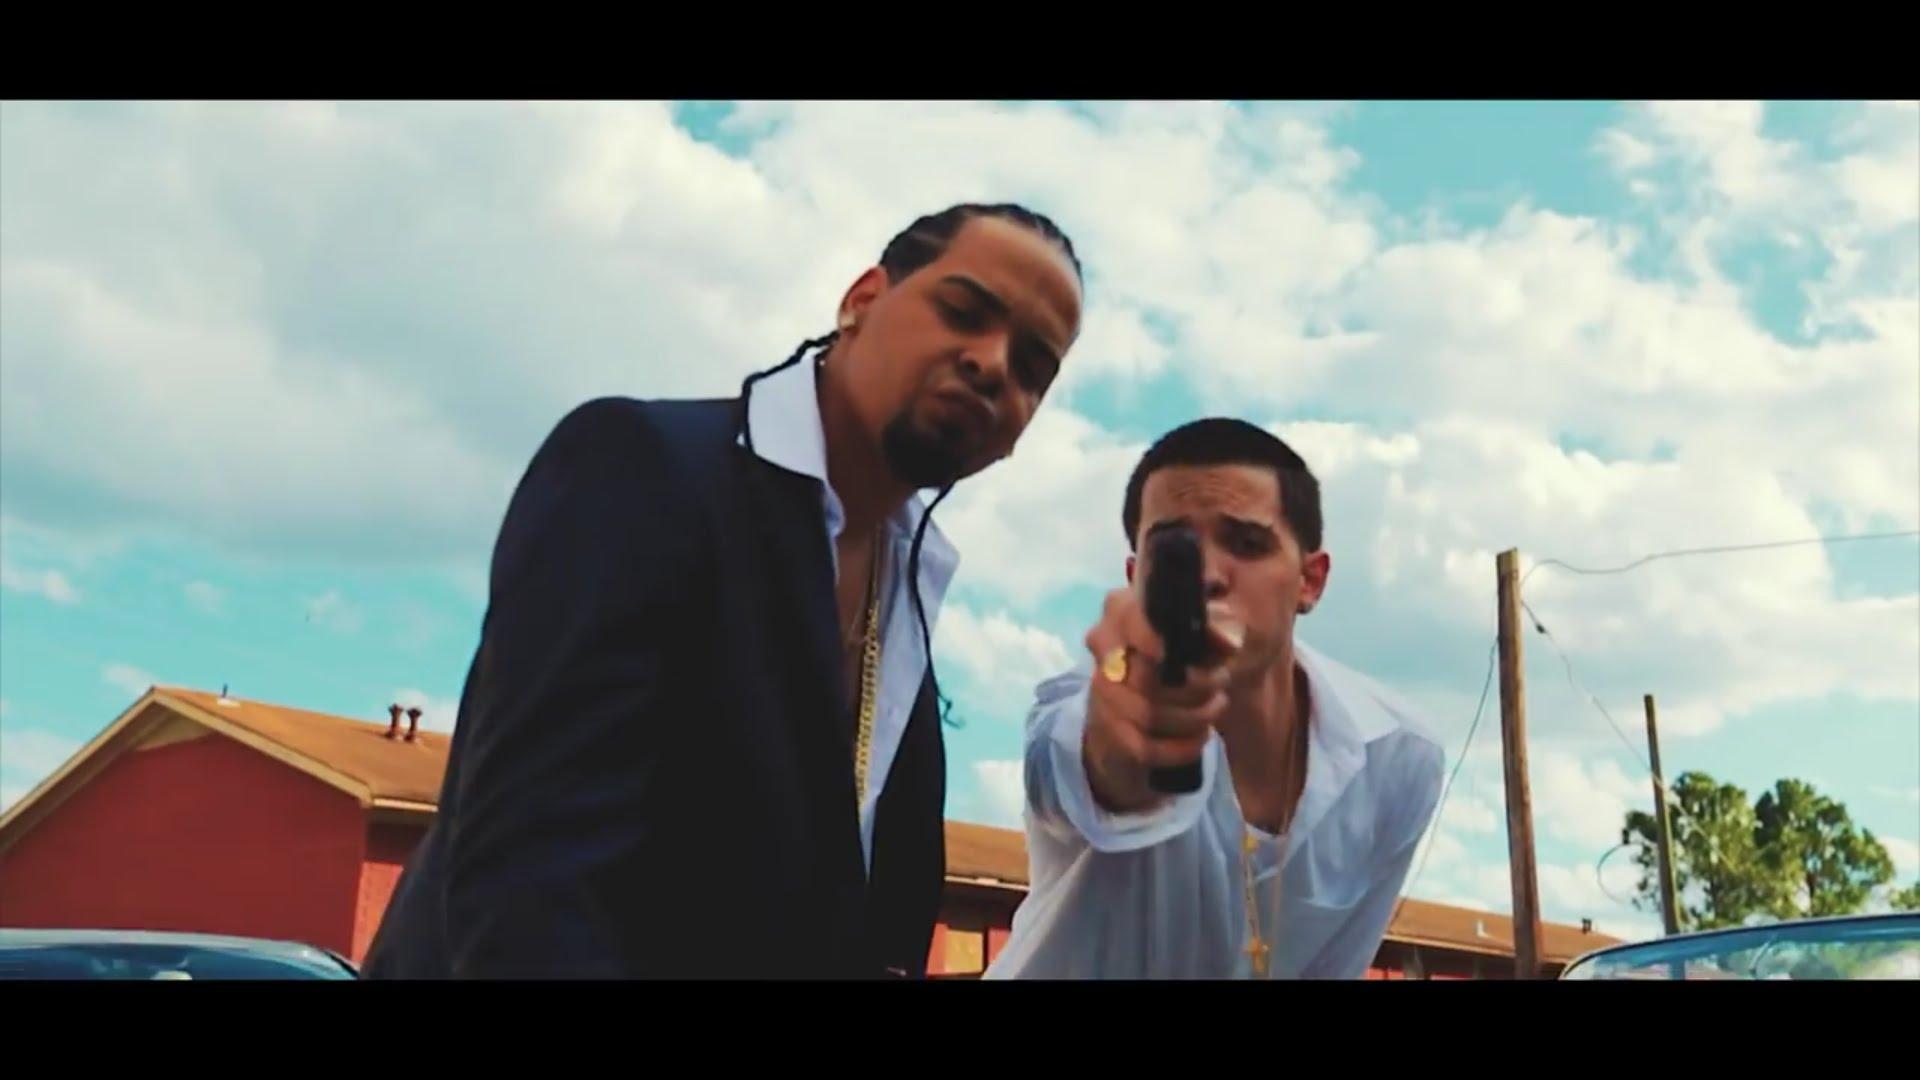 buba clan ft kas young murda la 1 - Buba Clan Ft. Kas Young Murda - La Calle (Video Official HD)